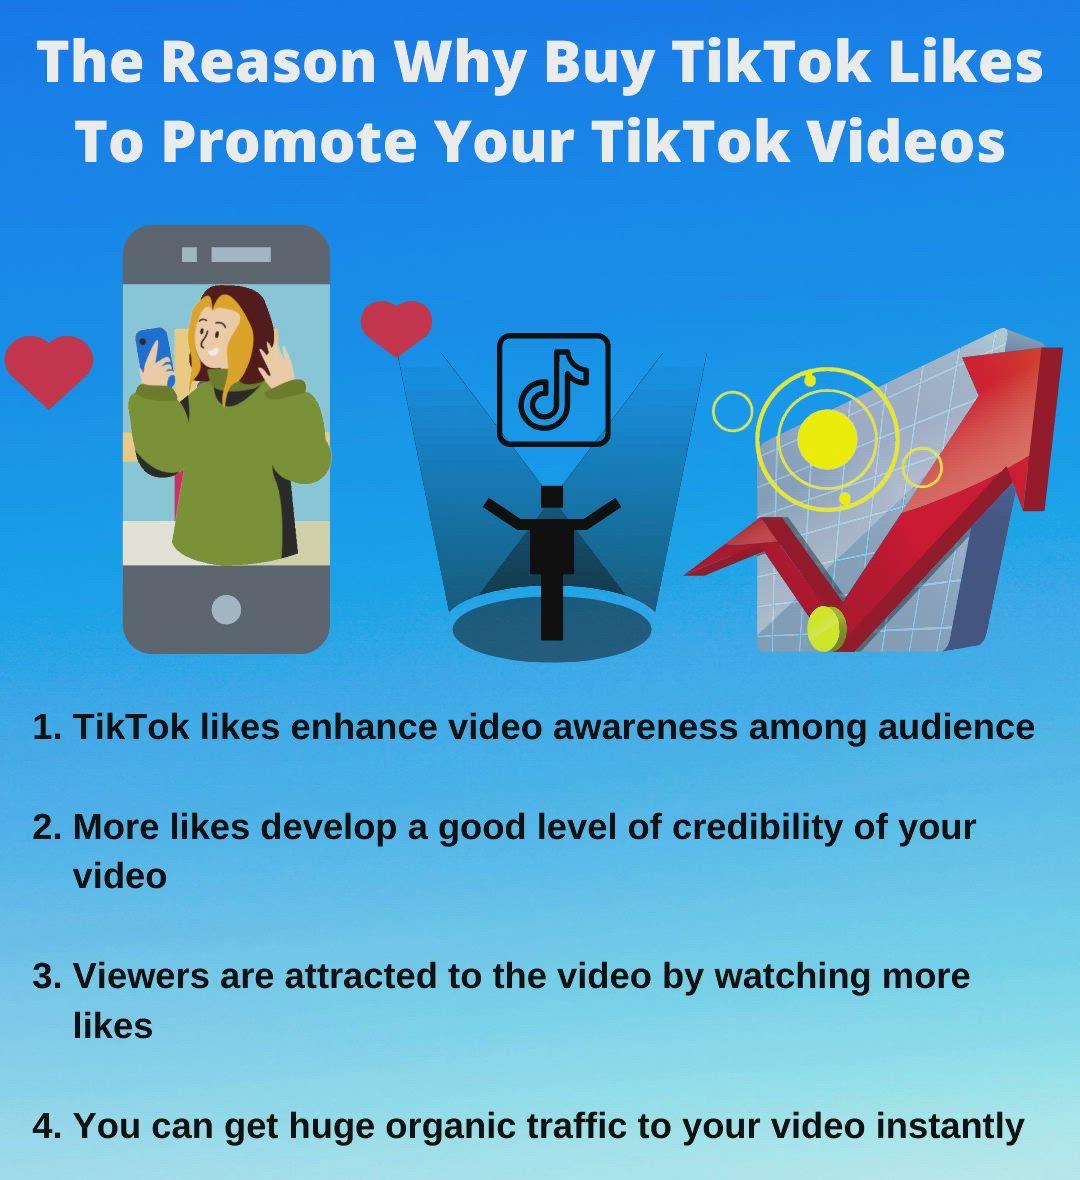 The Reason Why Buy Tiktok Likes To Promote Your Tiktok Videos Video In 2020 Social Media Popular Music Social Media Services